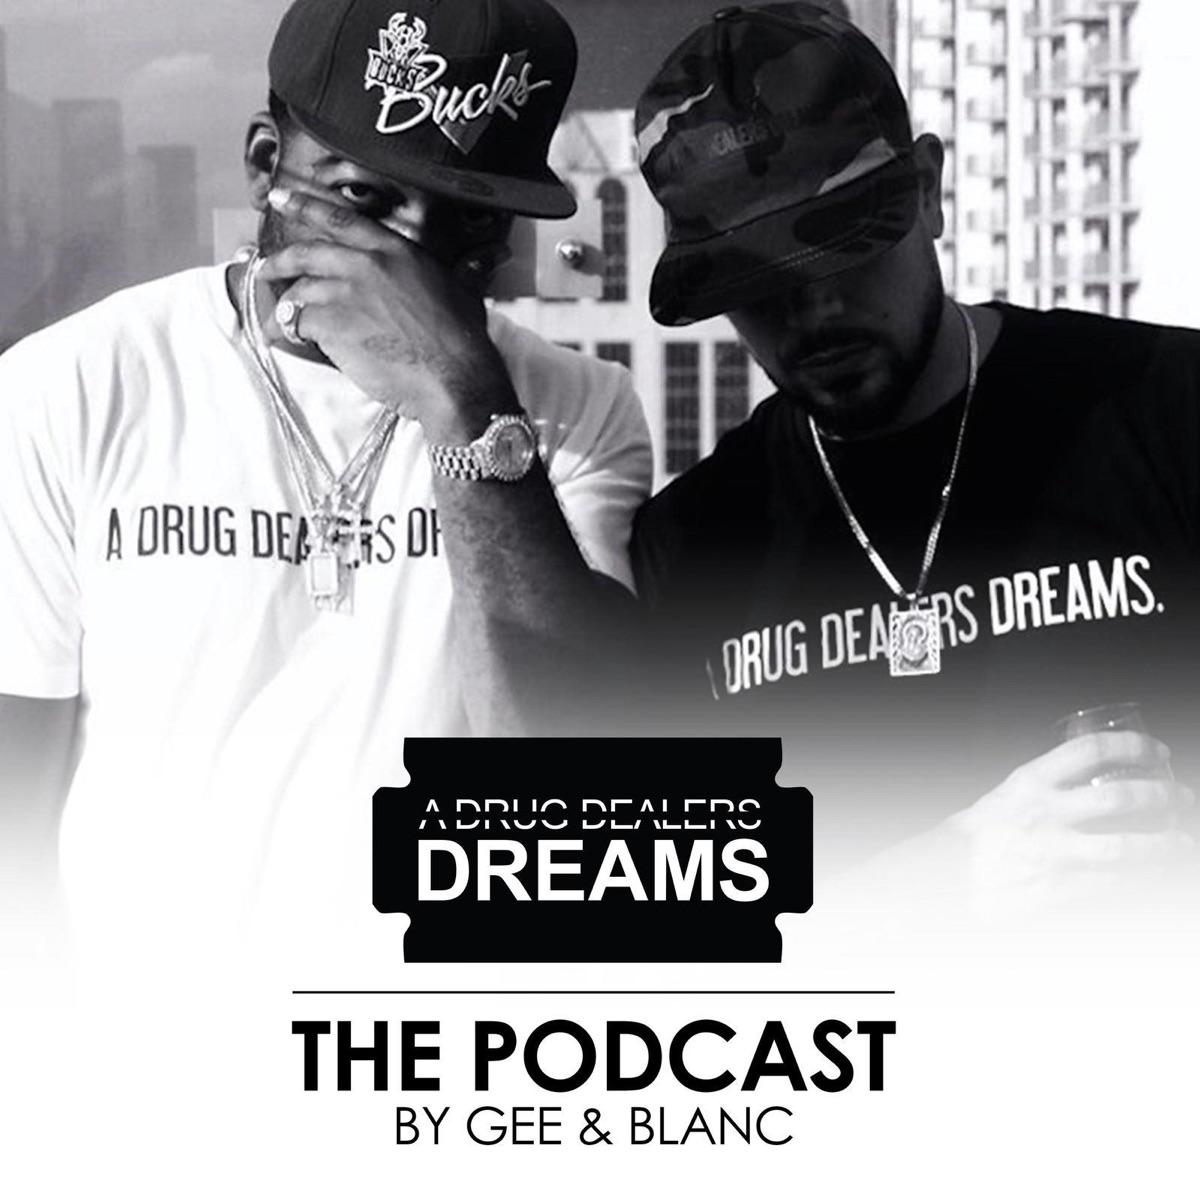 A Drug Dealers Dreams